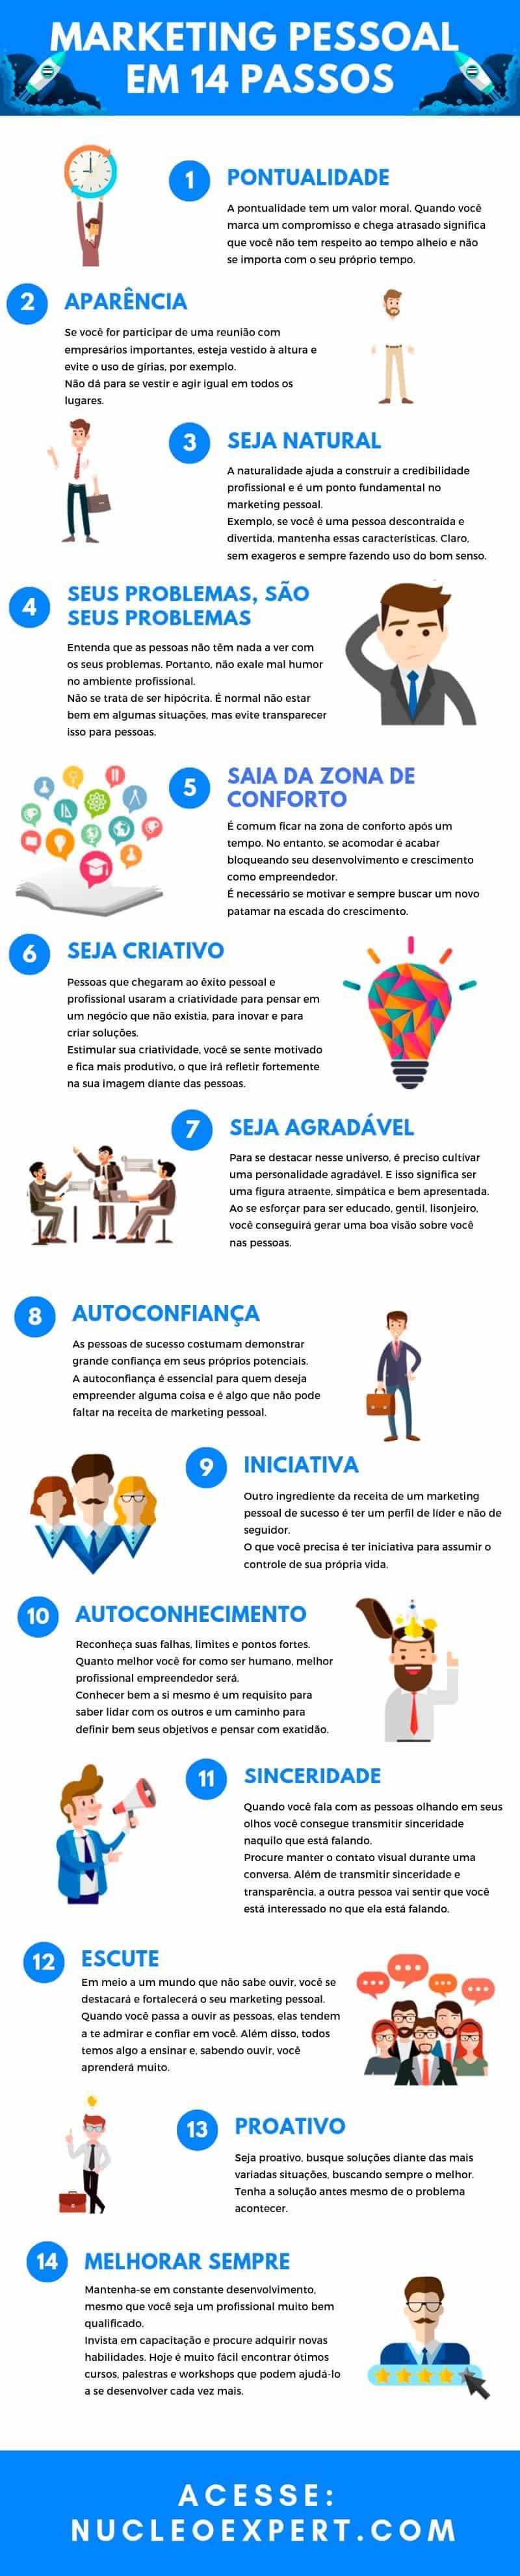 Infográfico Marketing Pessoal